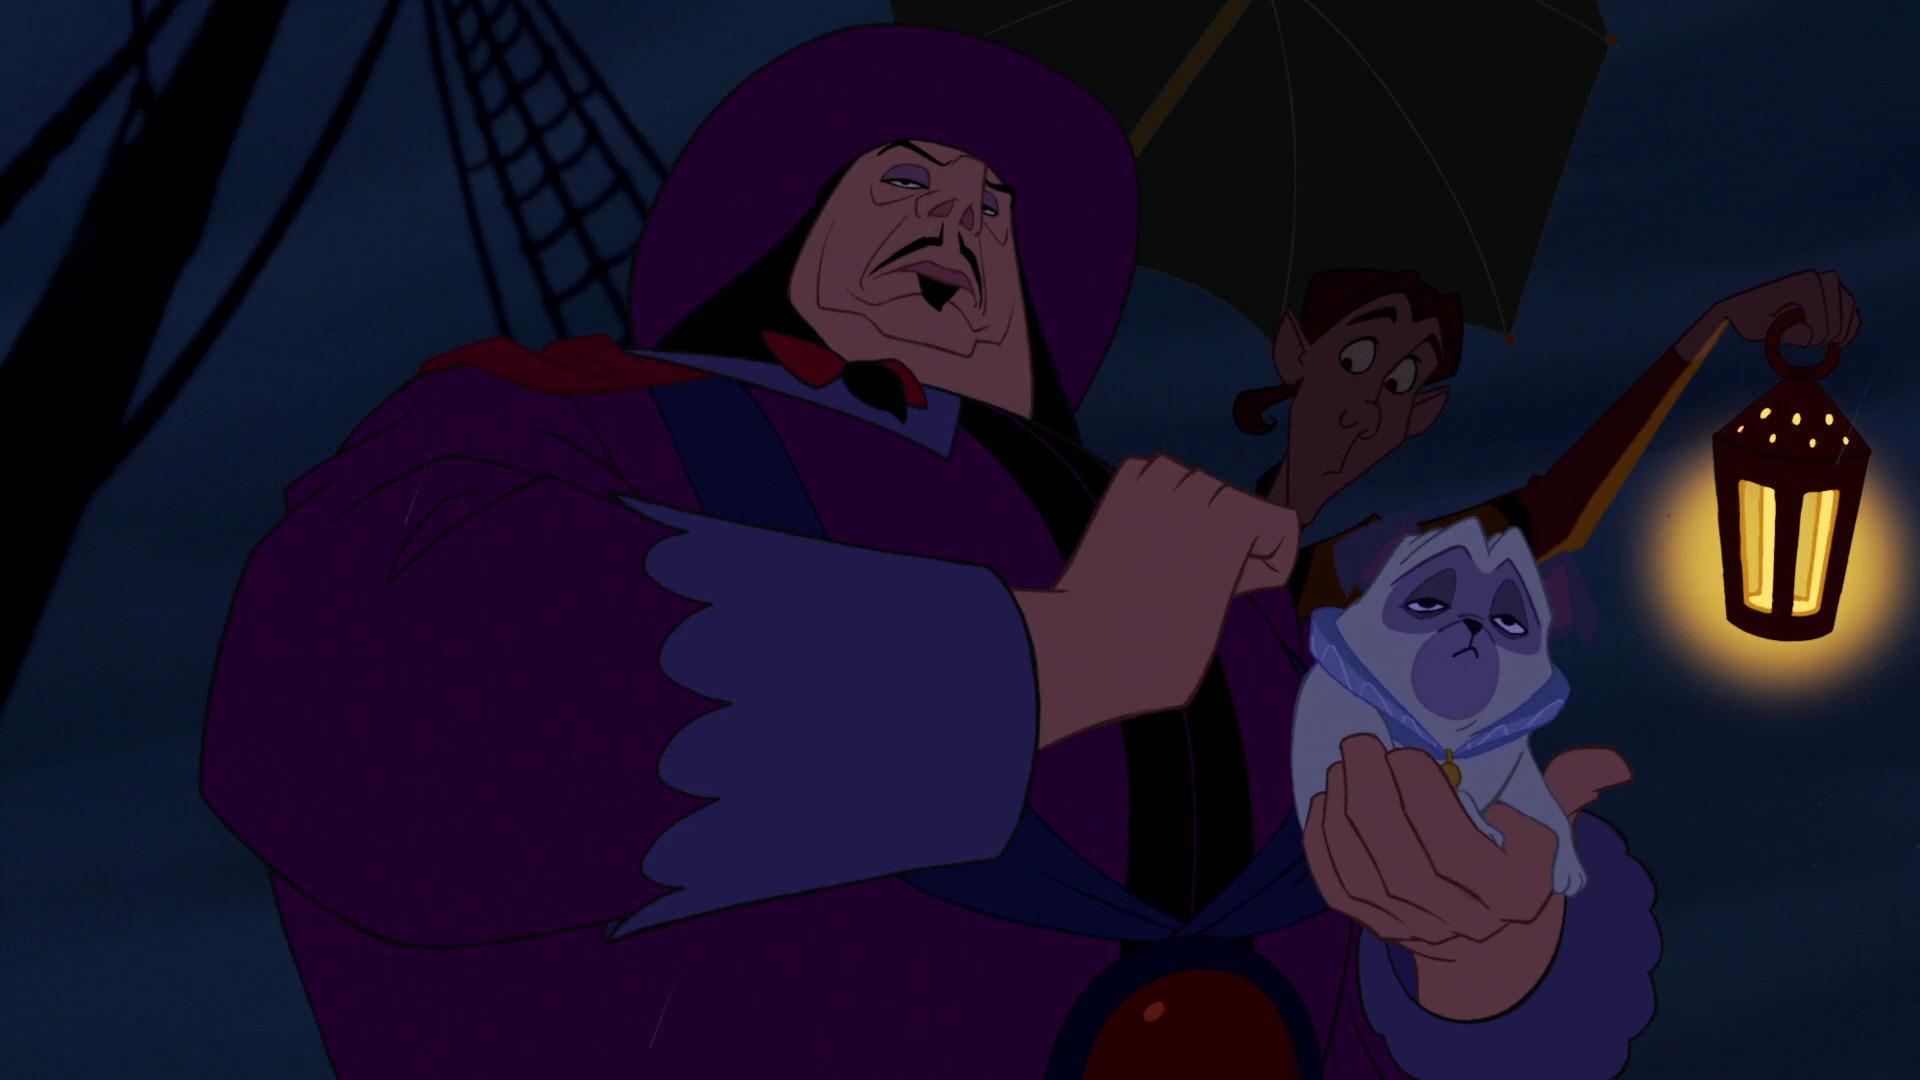 Disney Villains Series 2?